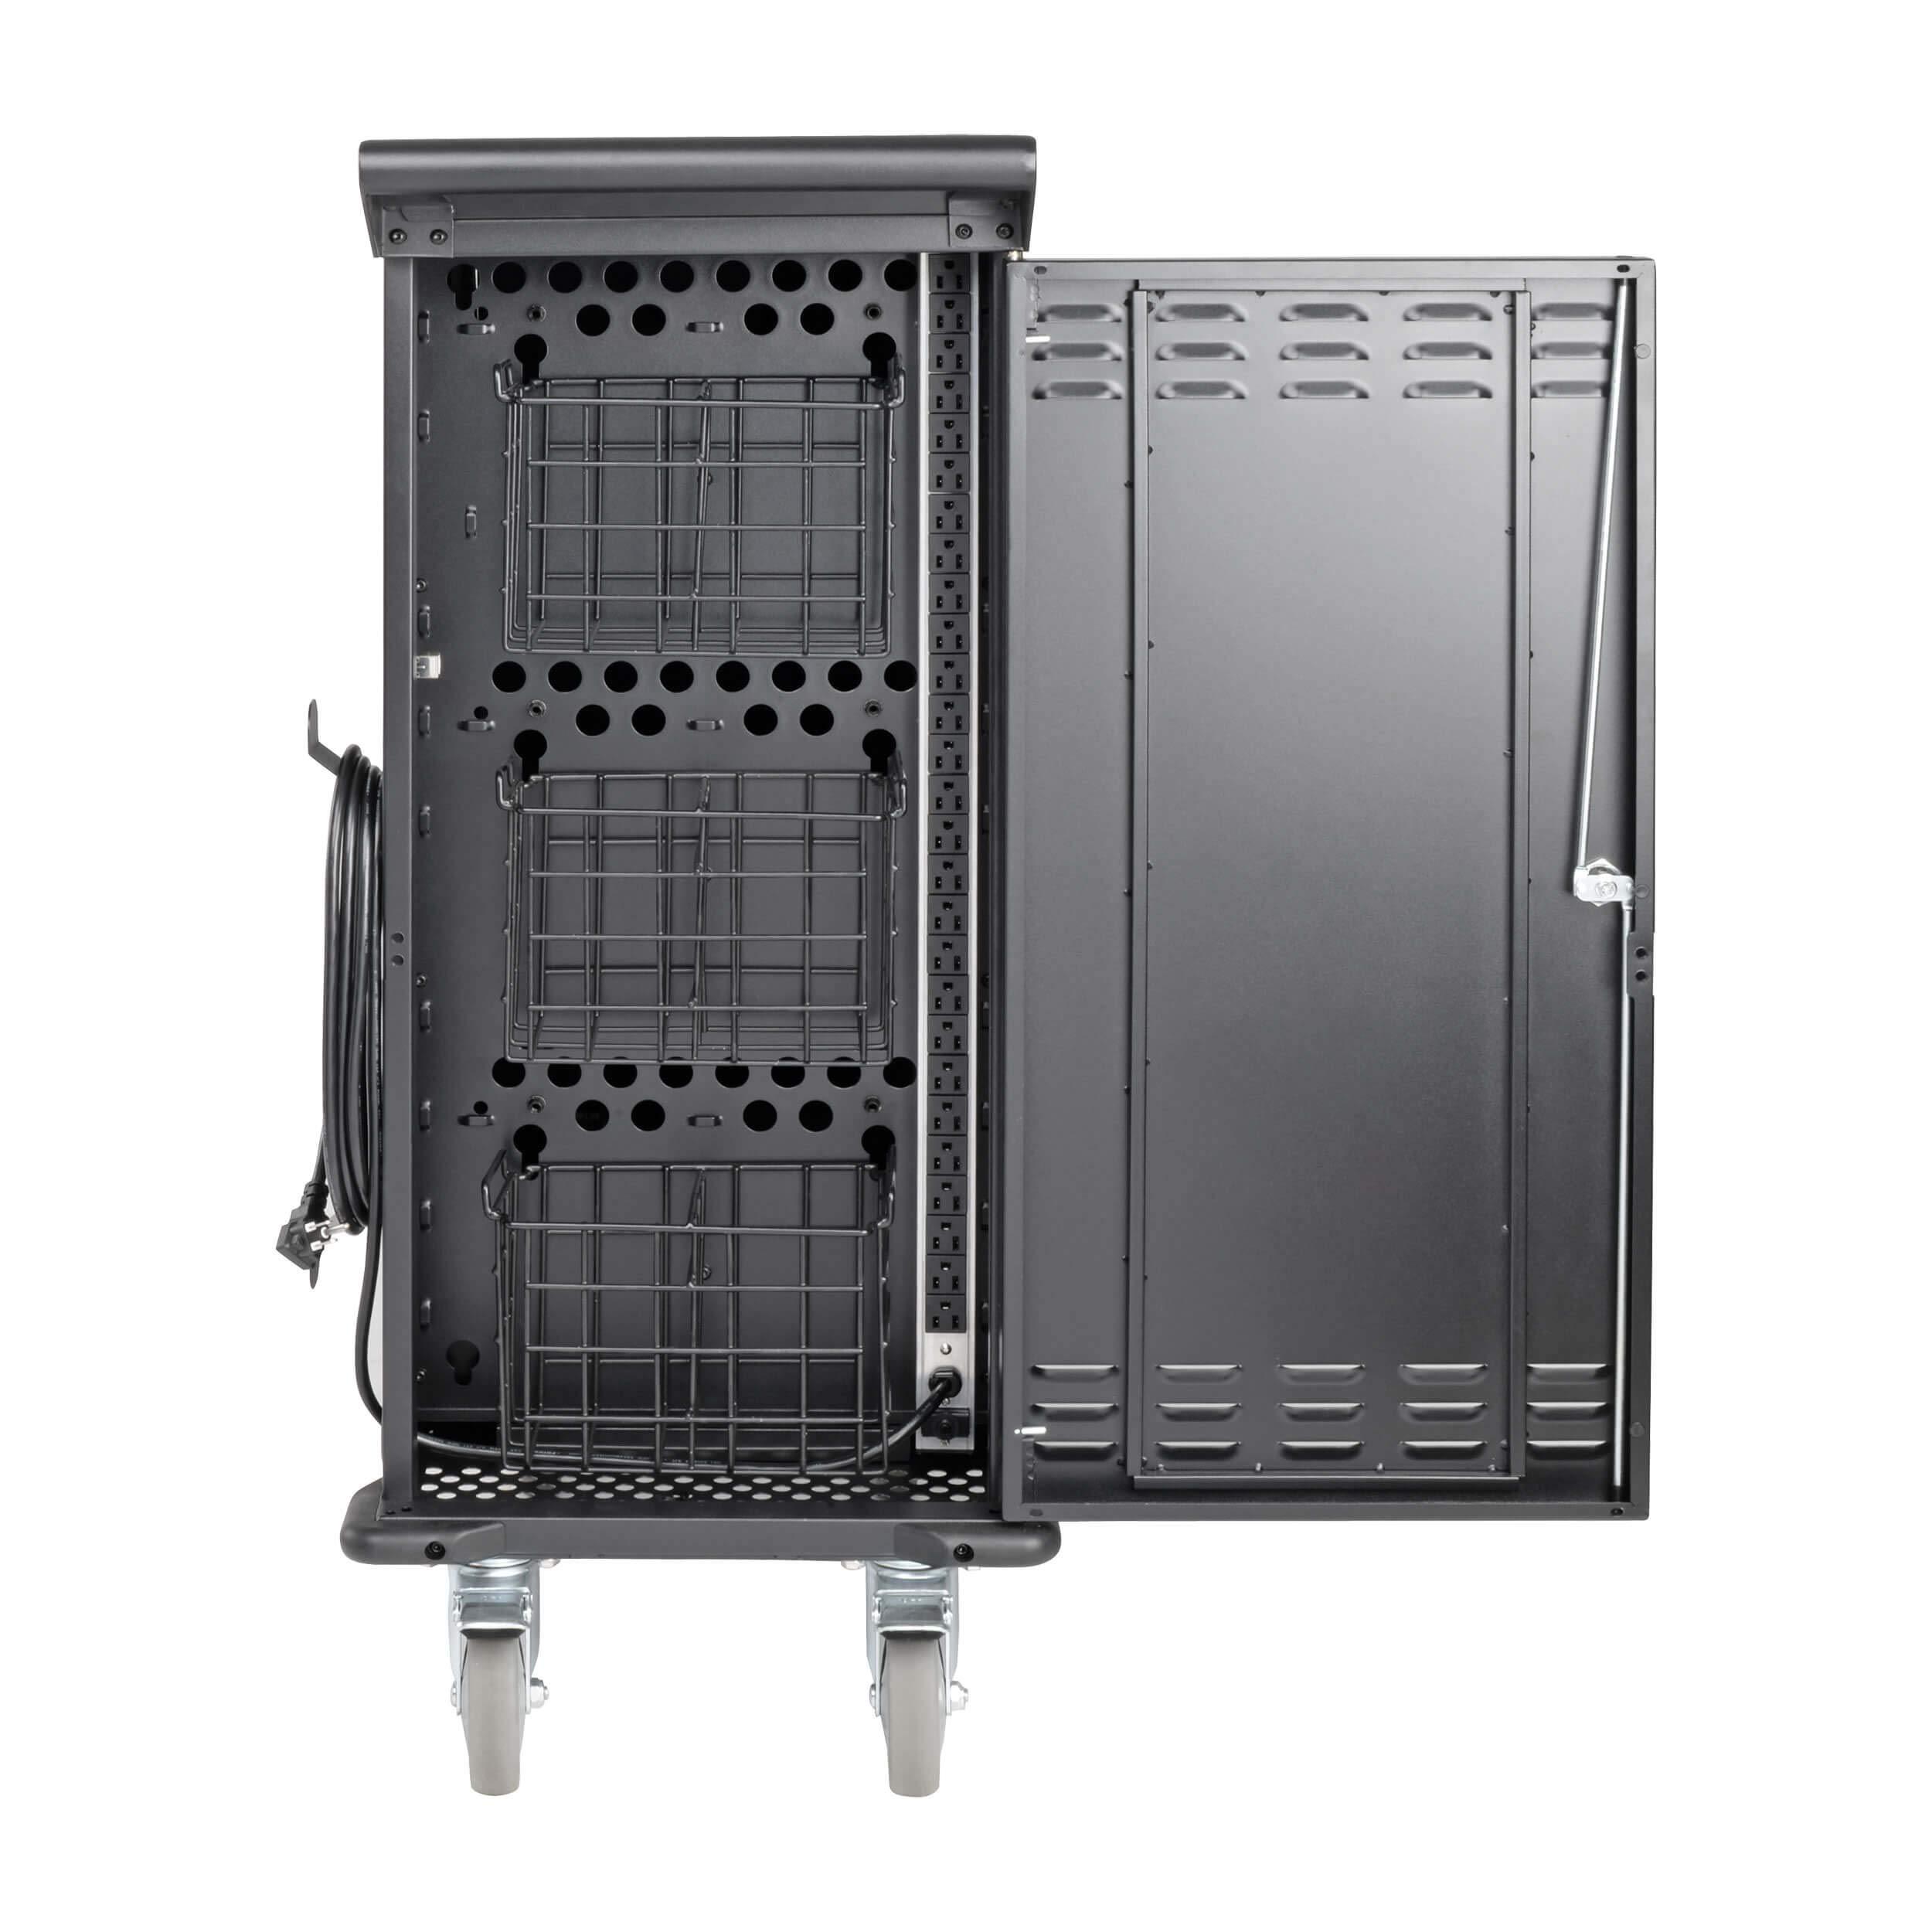 Tripp Lite 27-Port AC Mobile Charging Cart Storage Station for Chromebooks, iPads, Laptops, Tablets, Black (CSC27AC) by Tripp Lite (Image #5)